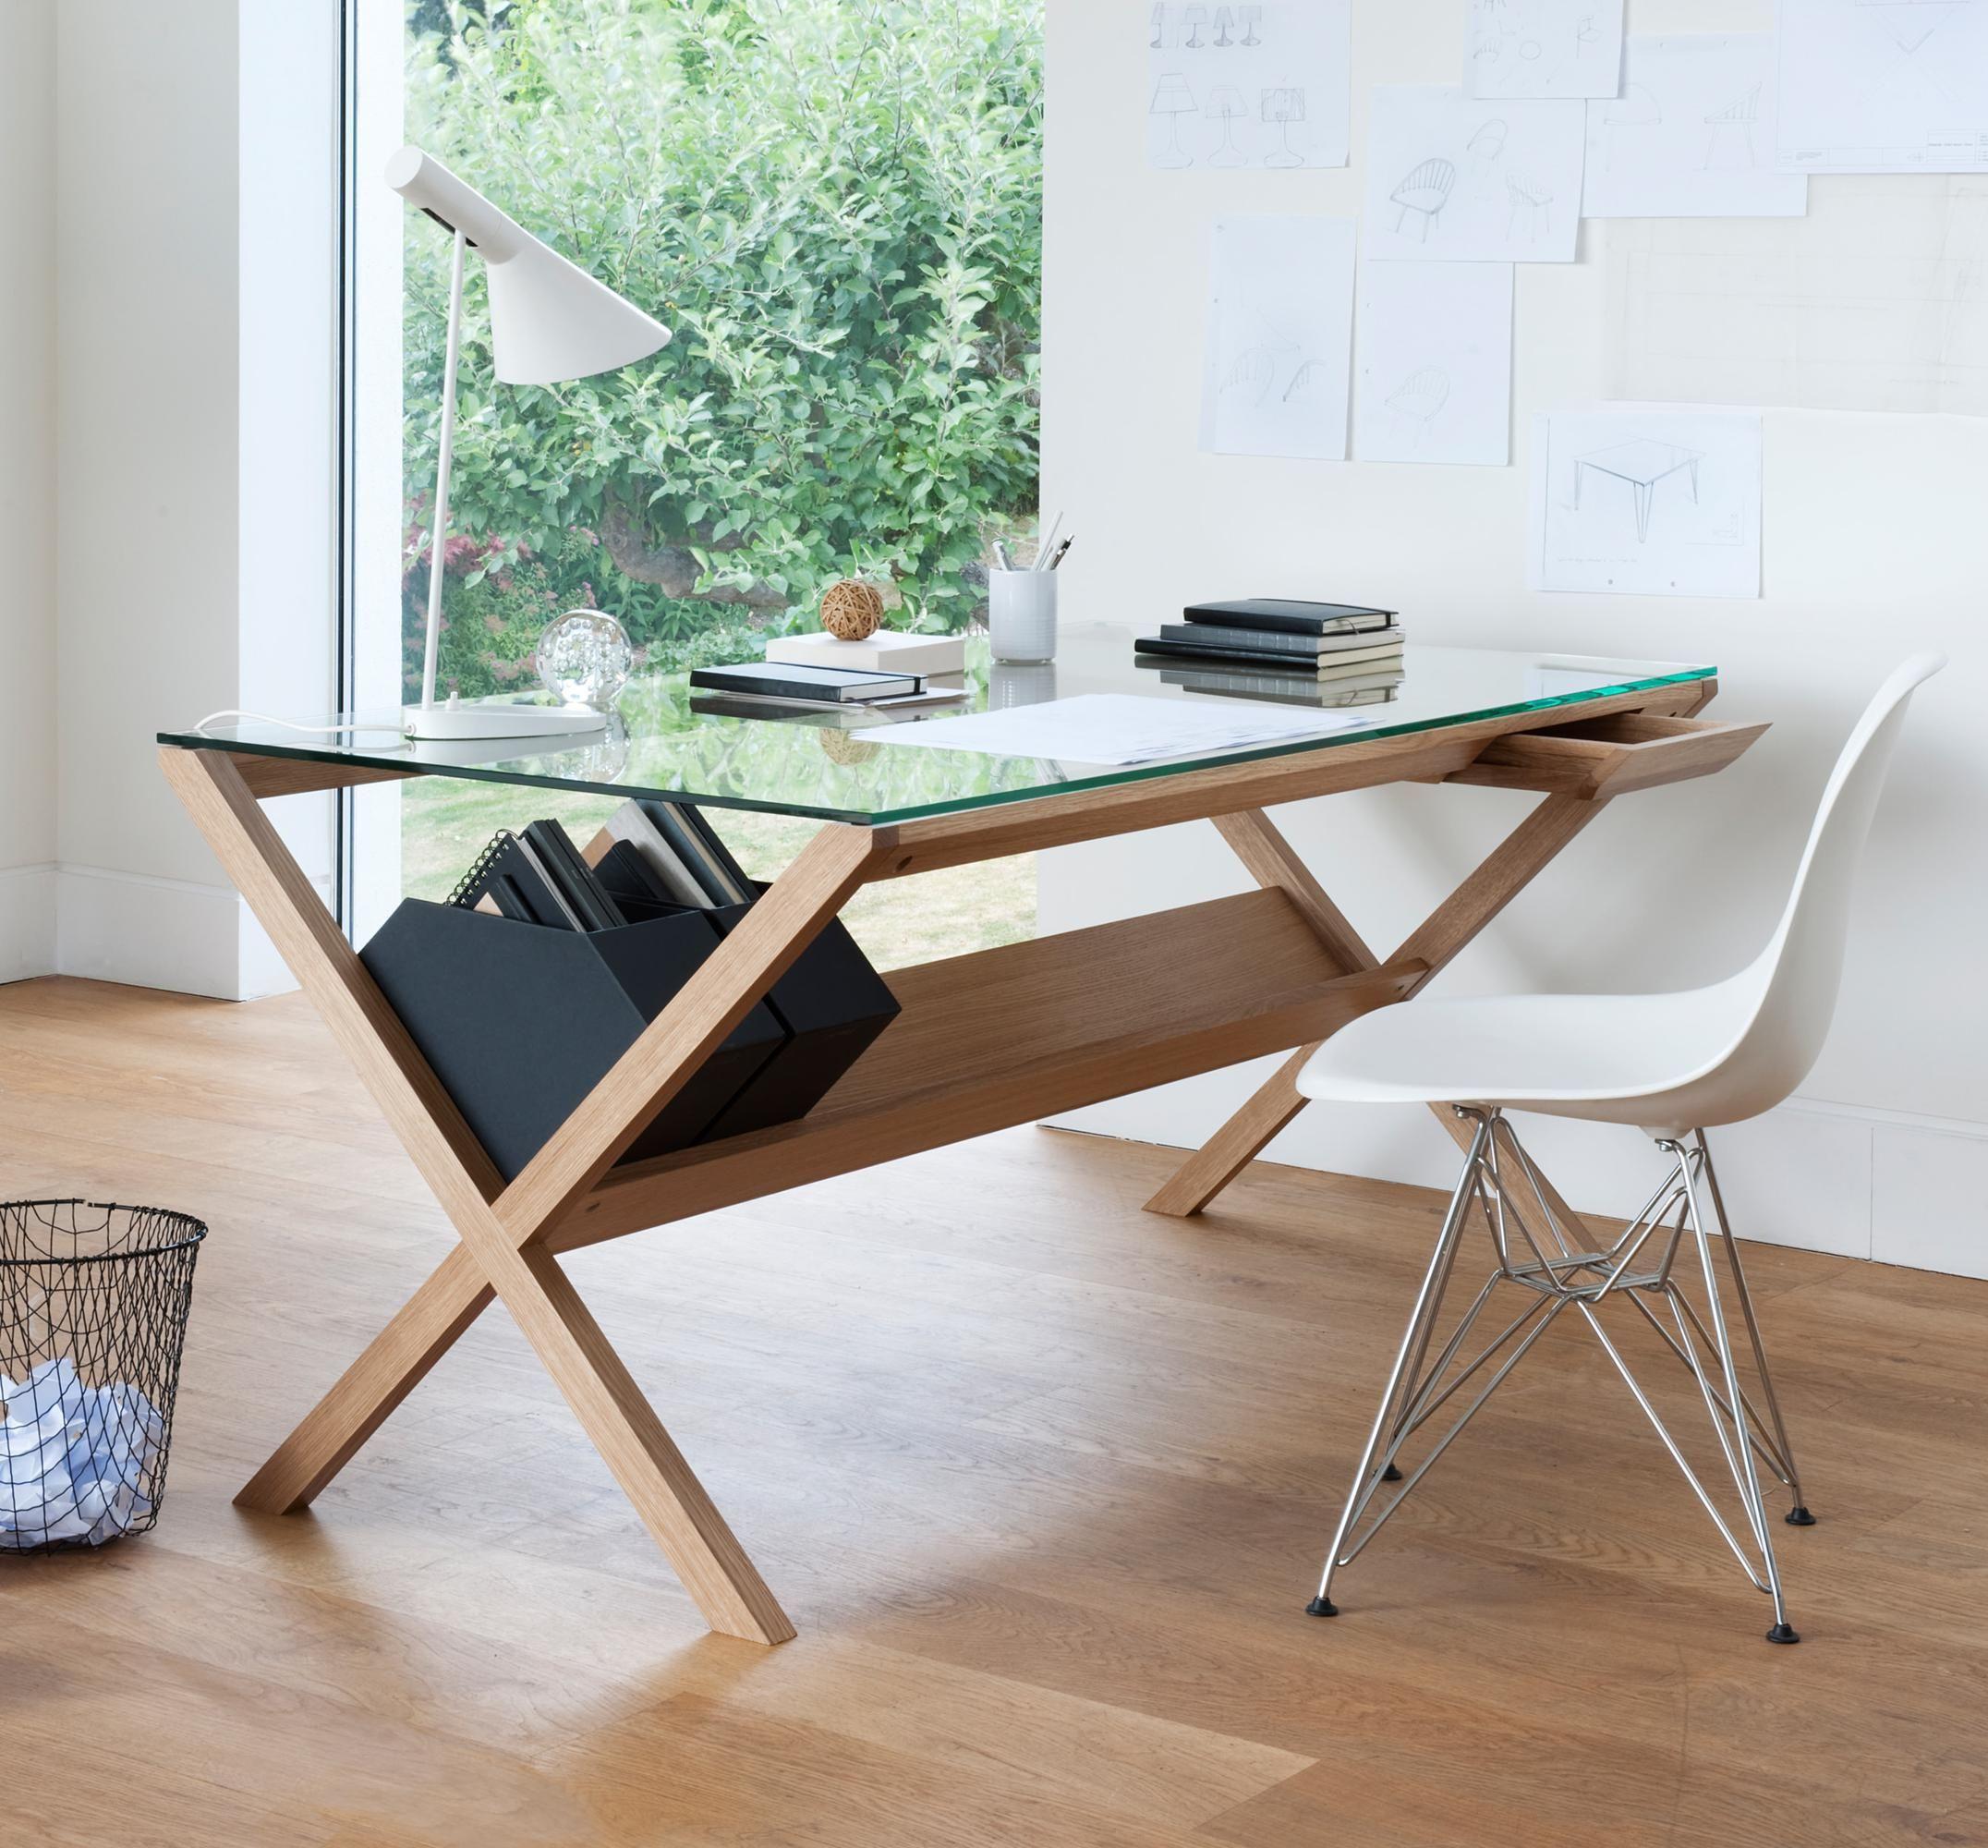 case furniture covet desk wood and glass office workspace rh pinterest com